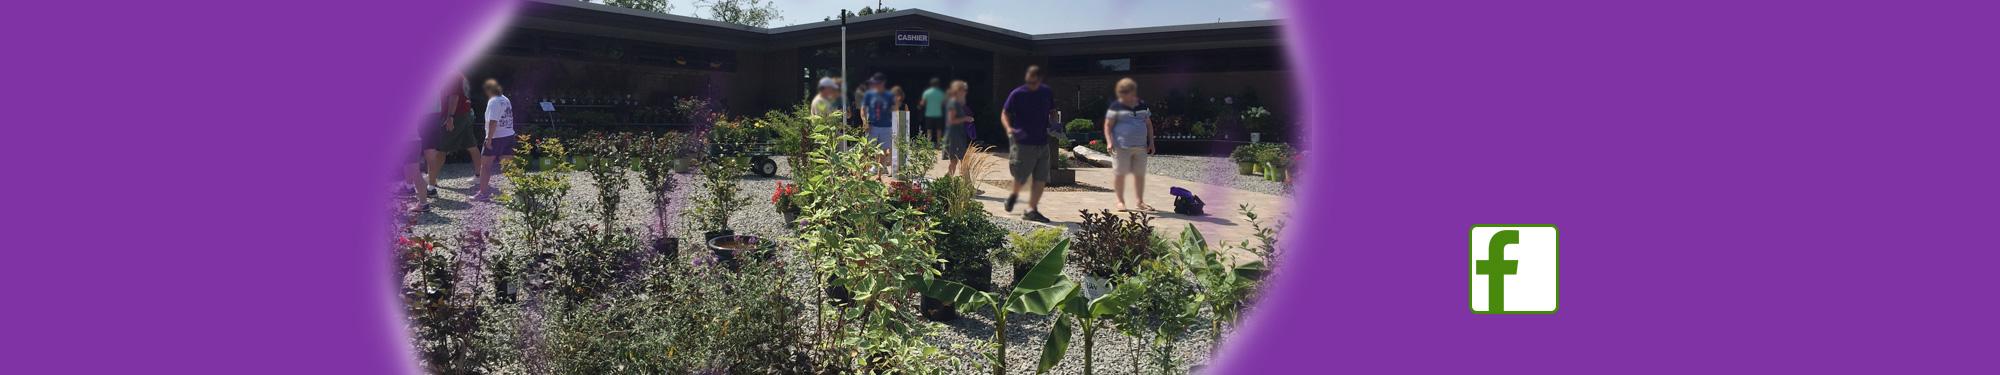 plant-nursery-murrysville